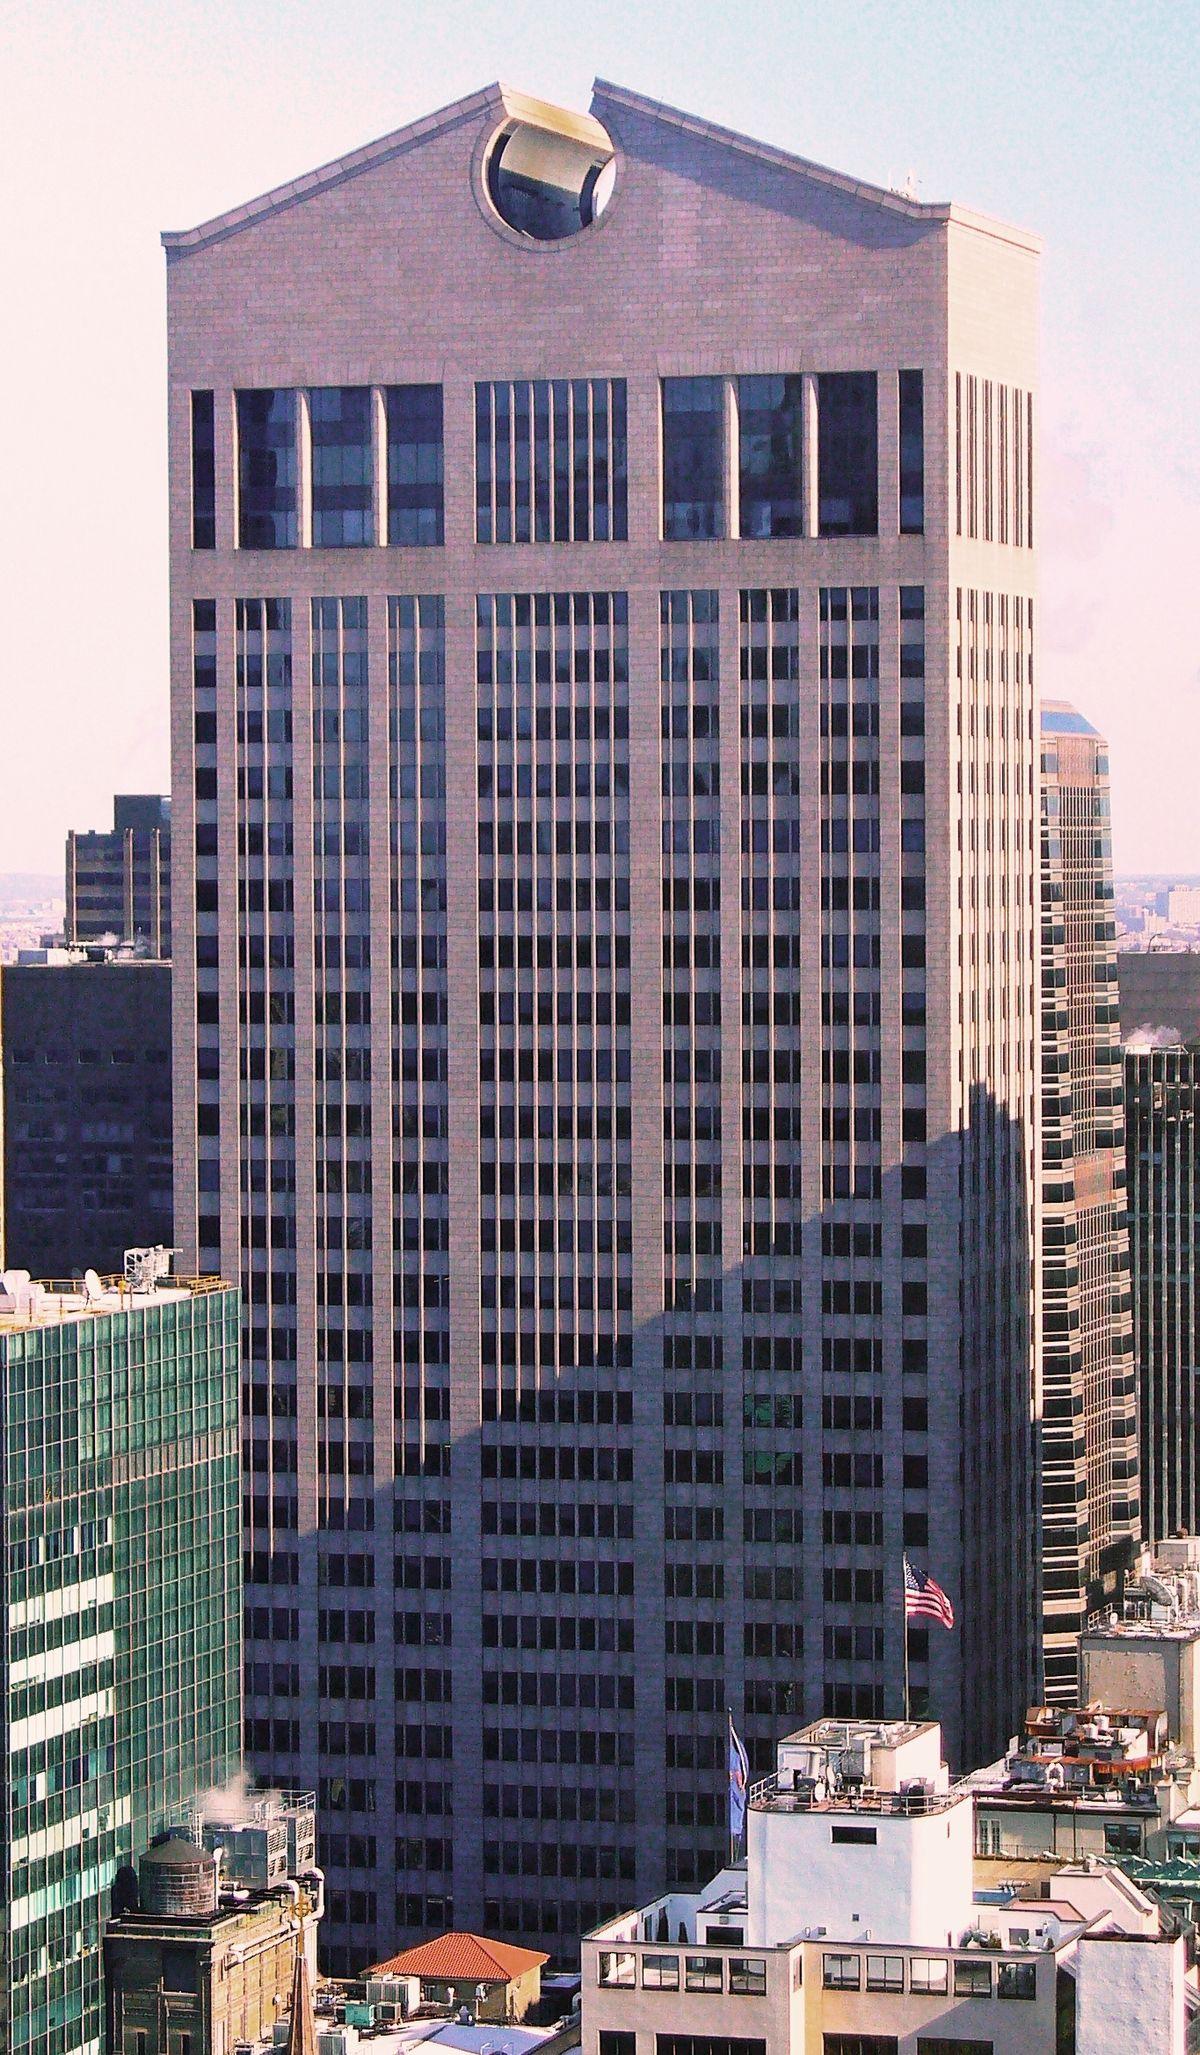 550 Madison Avenue, Philip Johnson